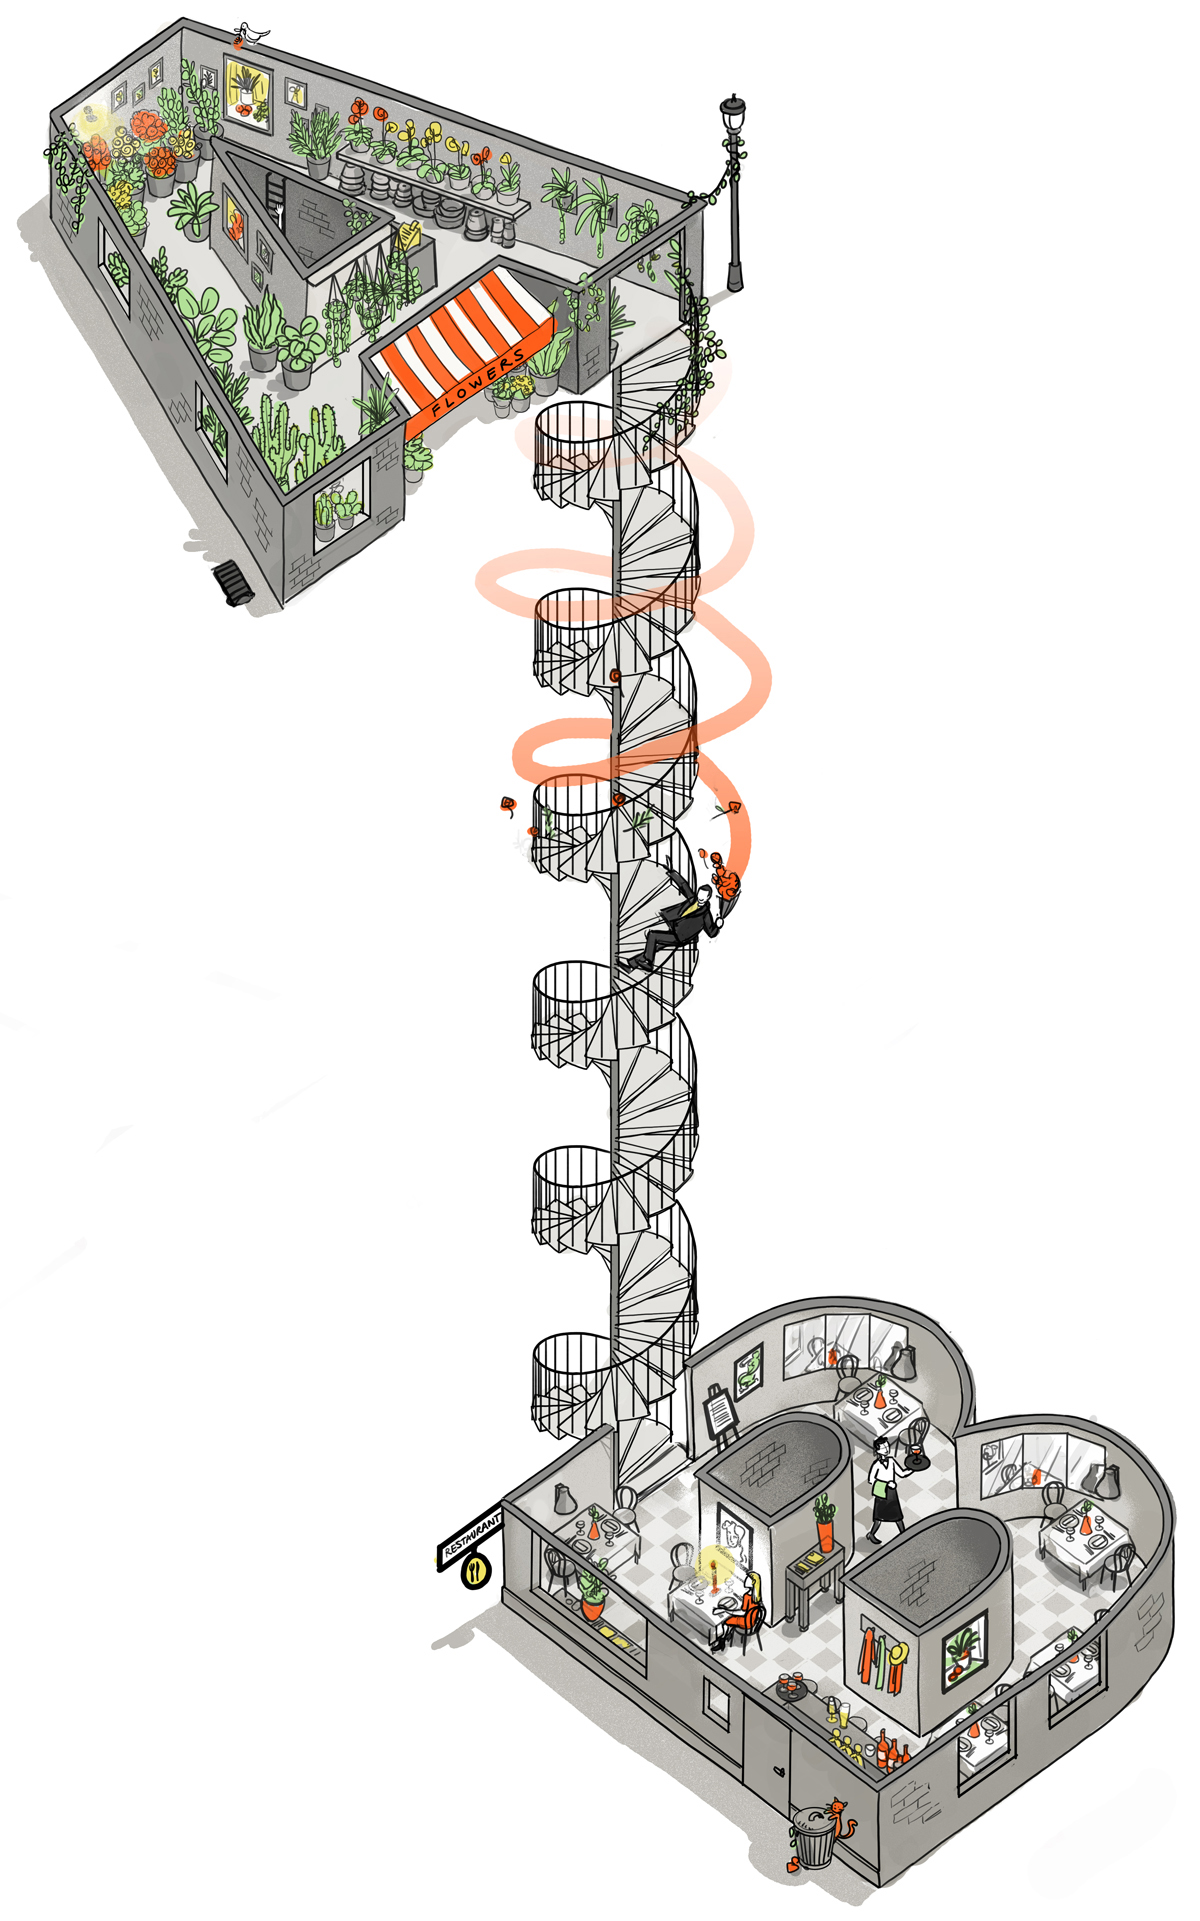 danae diaz illustration UBER sketches